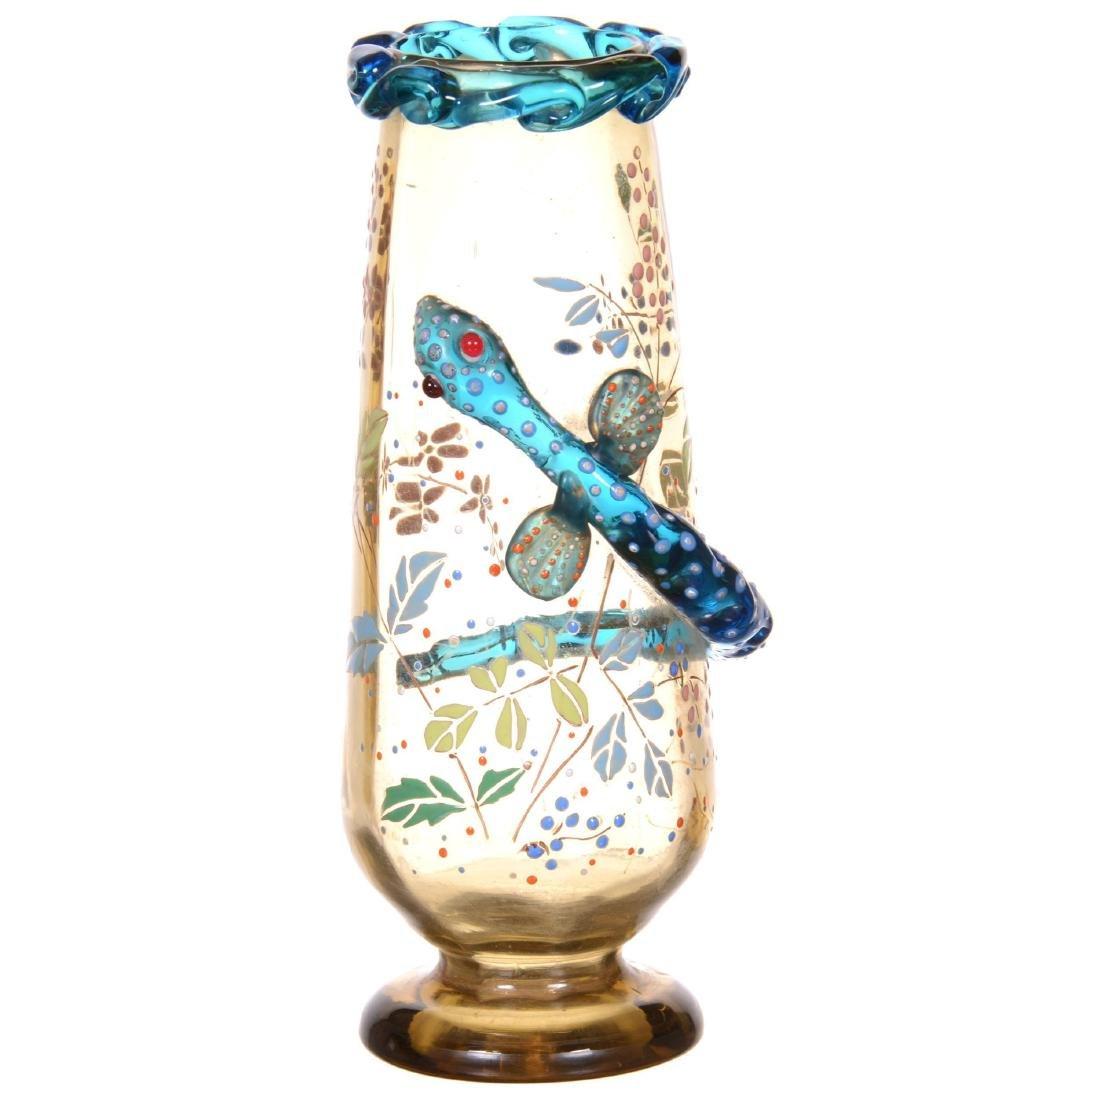 Unmarked Moser Art Glass Vase